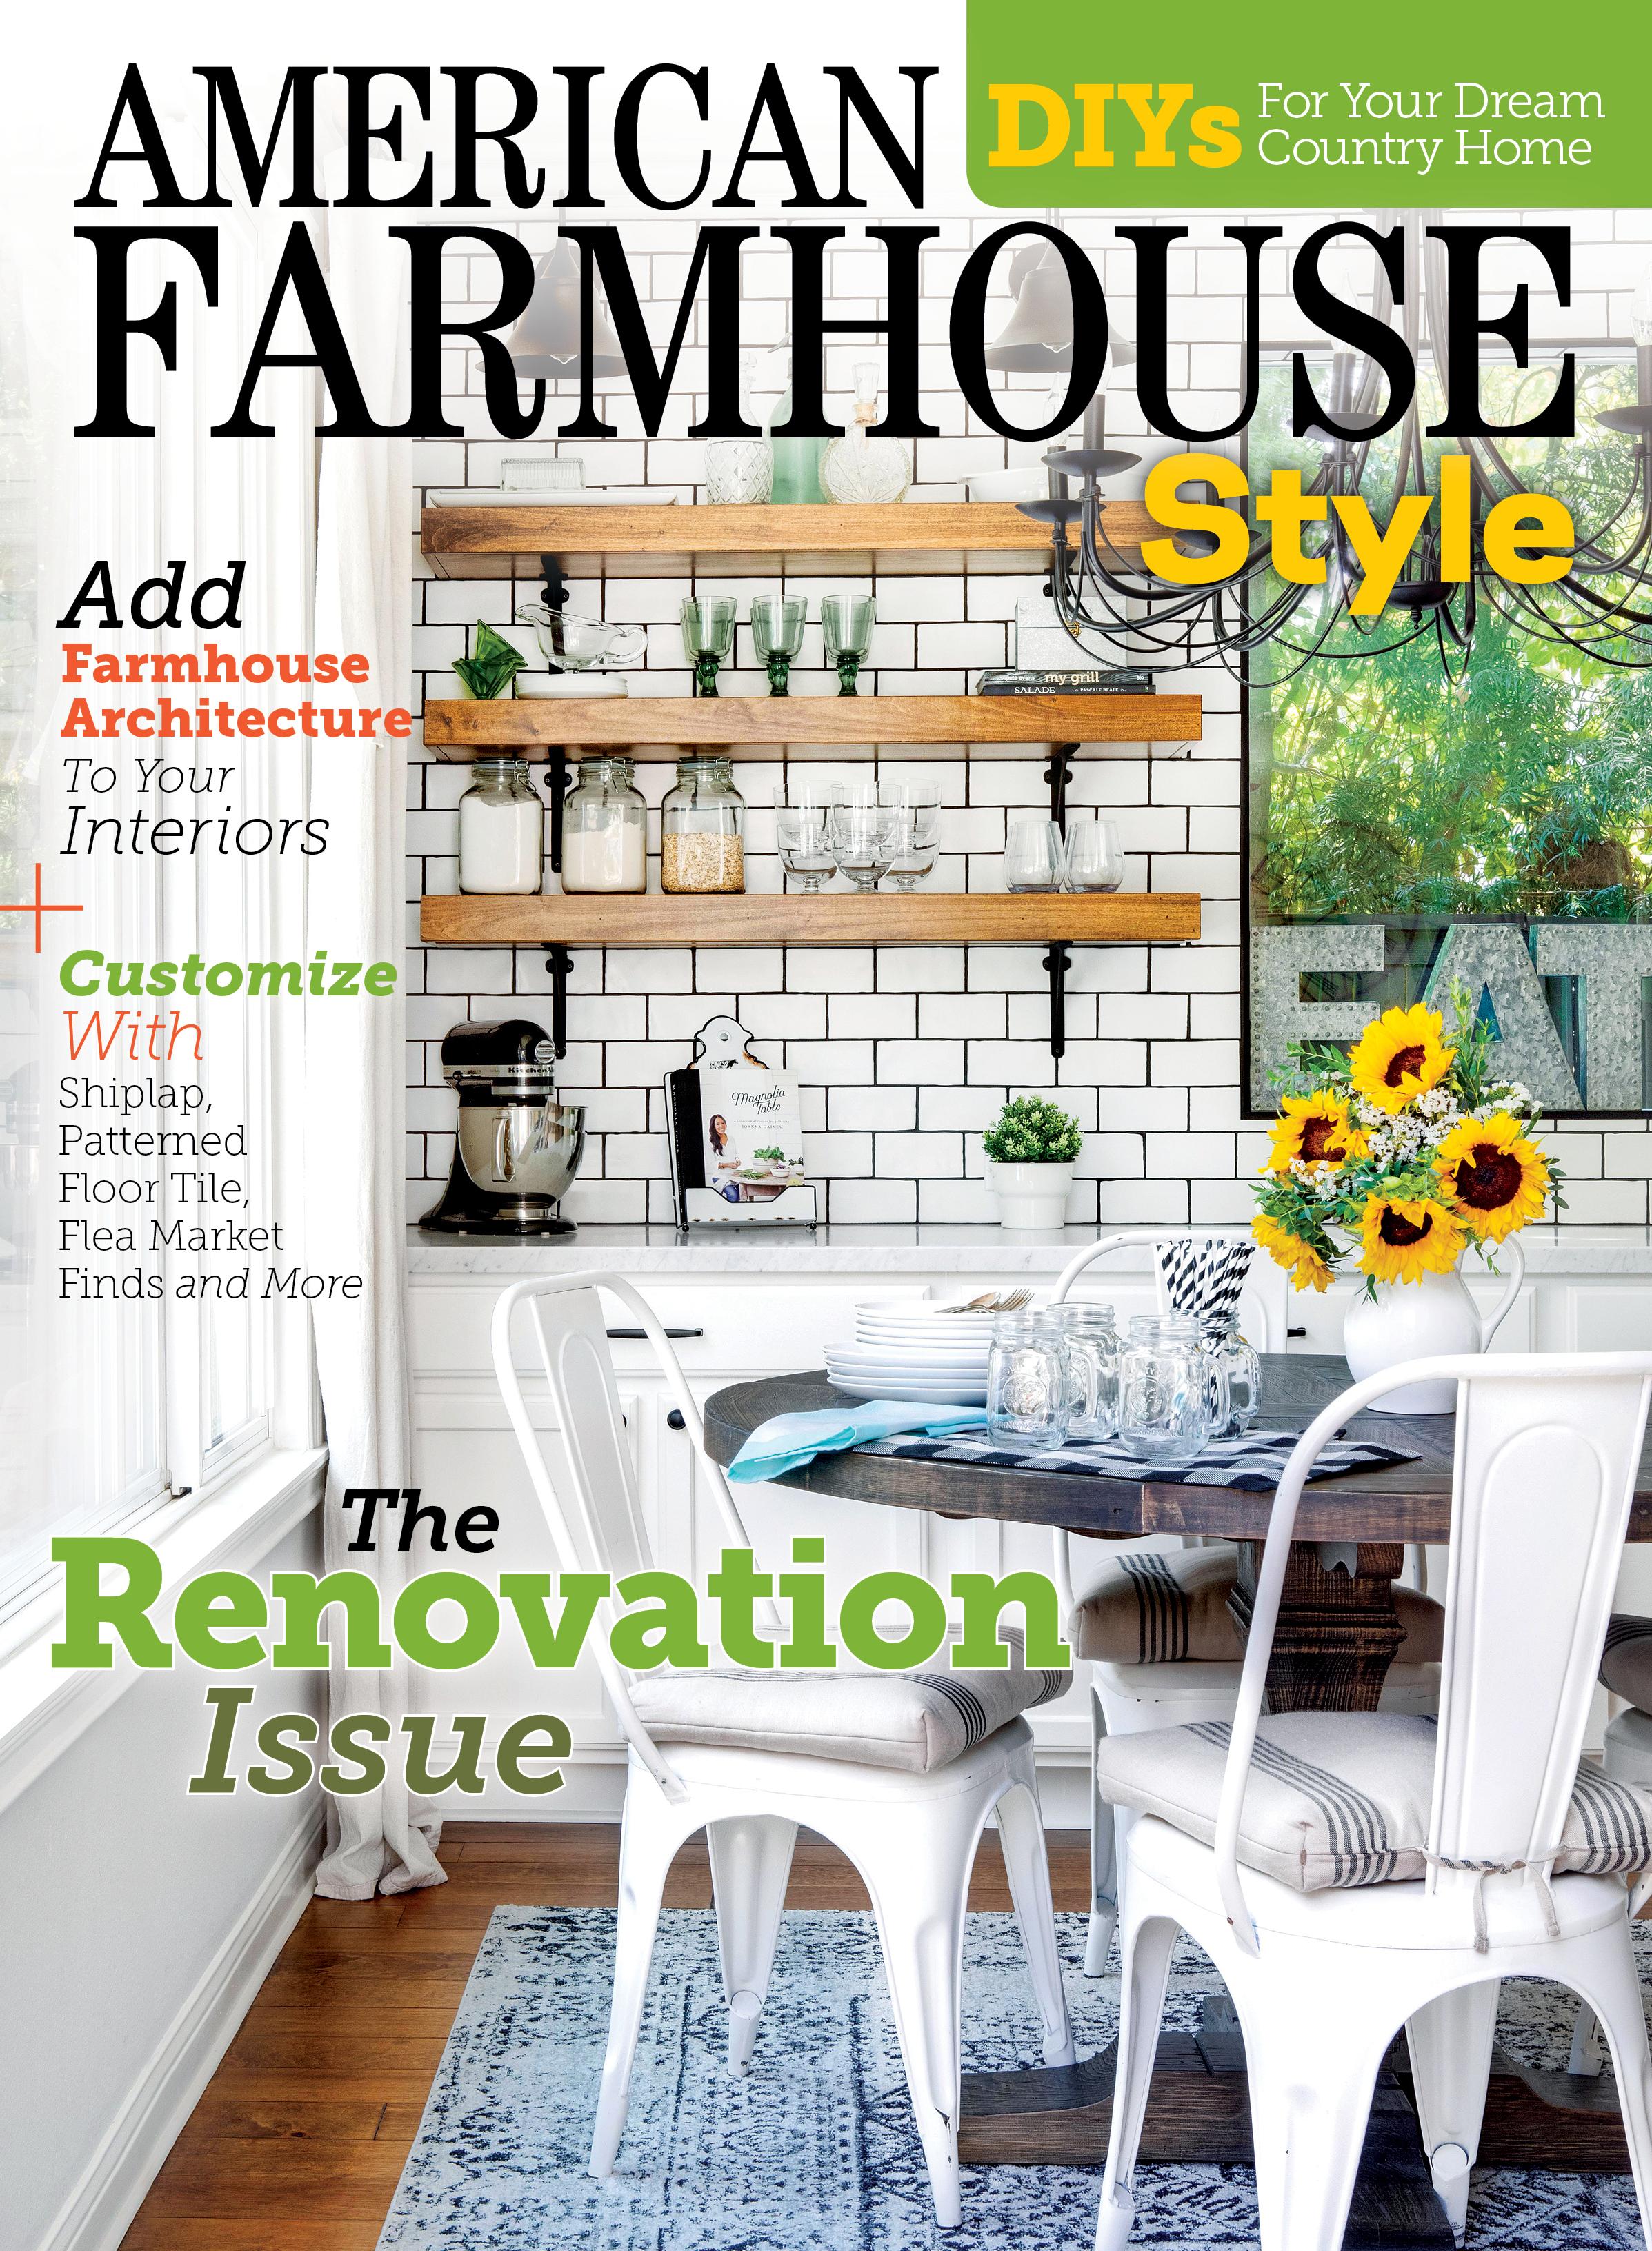 American Farmhouse Style Magazine | Rustic Winter Wedding Inspiration | Utah Event Planner and Designer | Michelle Leo Events